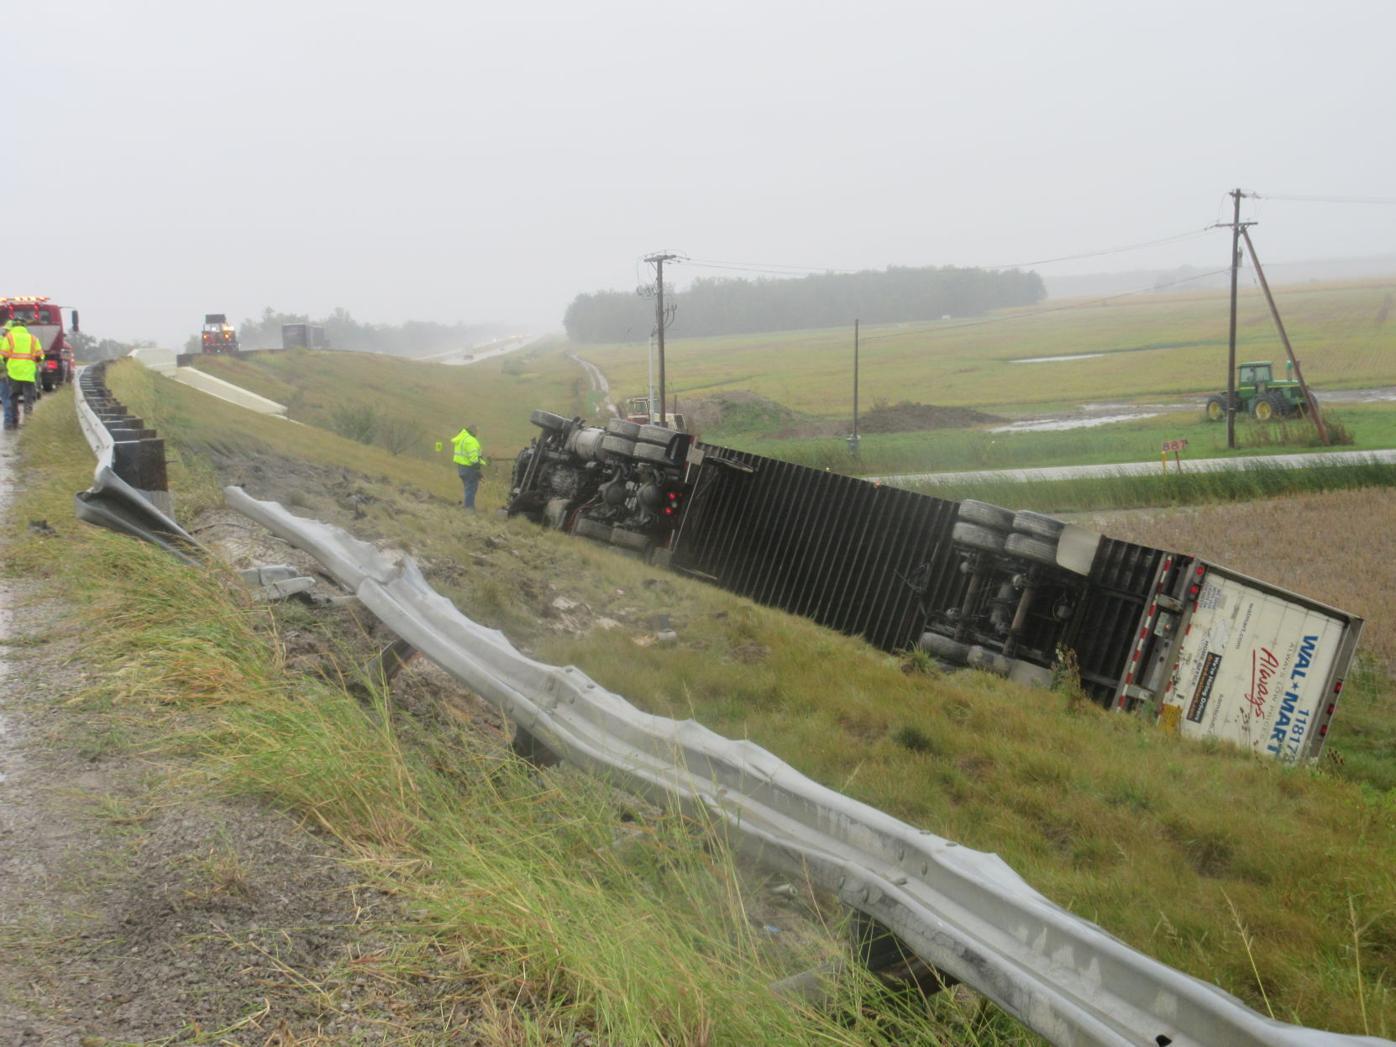 semi crash photo